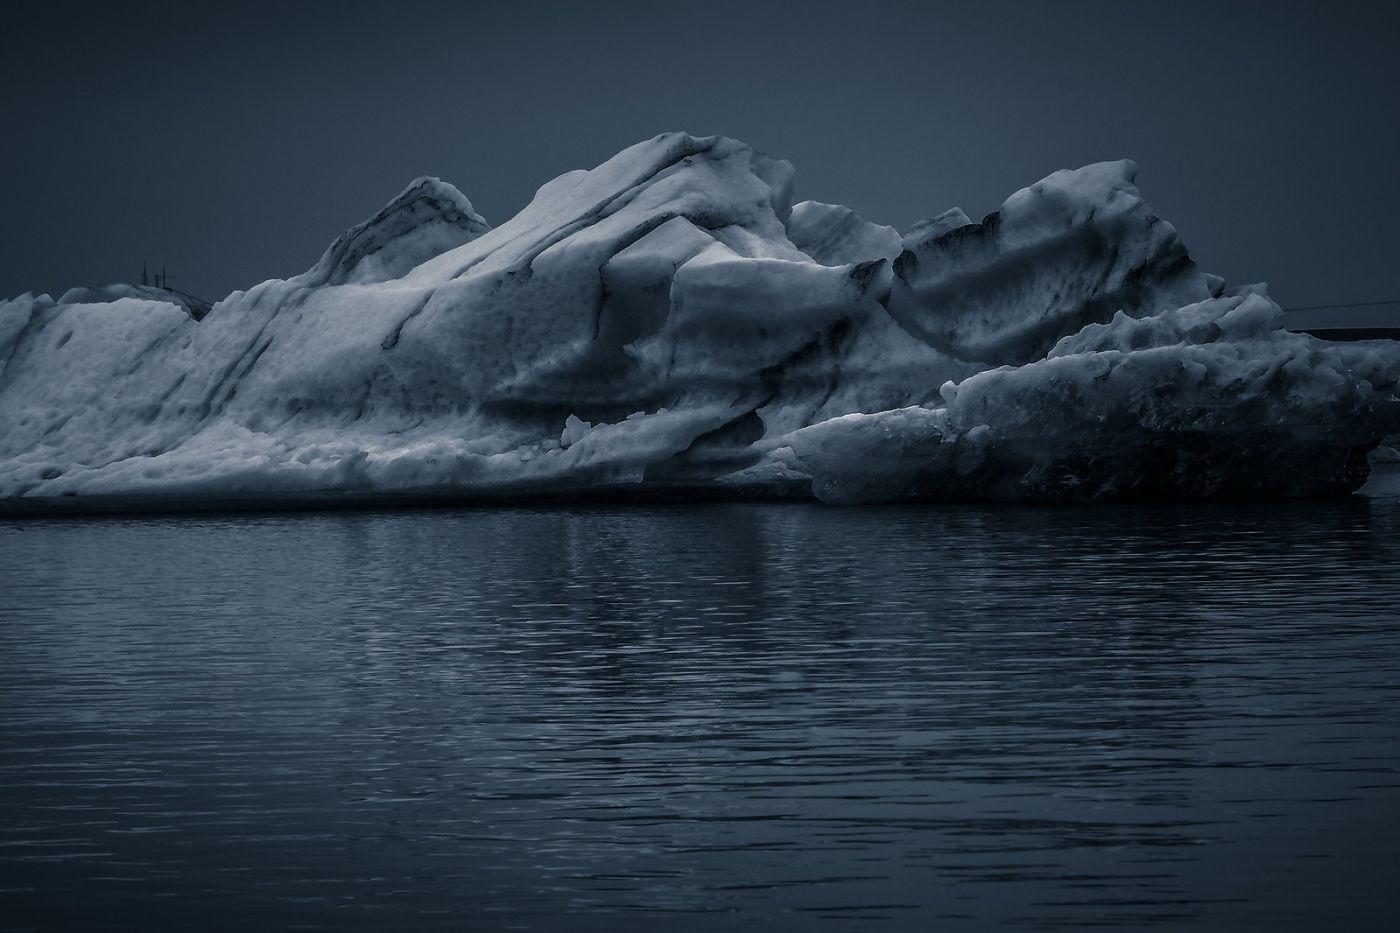 冰岛冰川泻湖(Glacier Lagoon),流动的冰川_图1-12